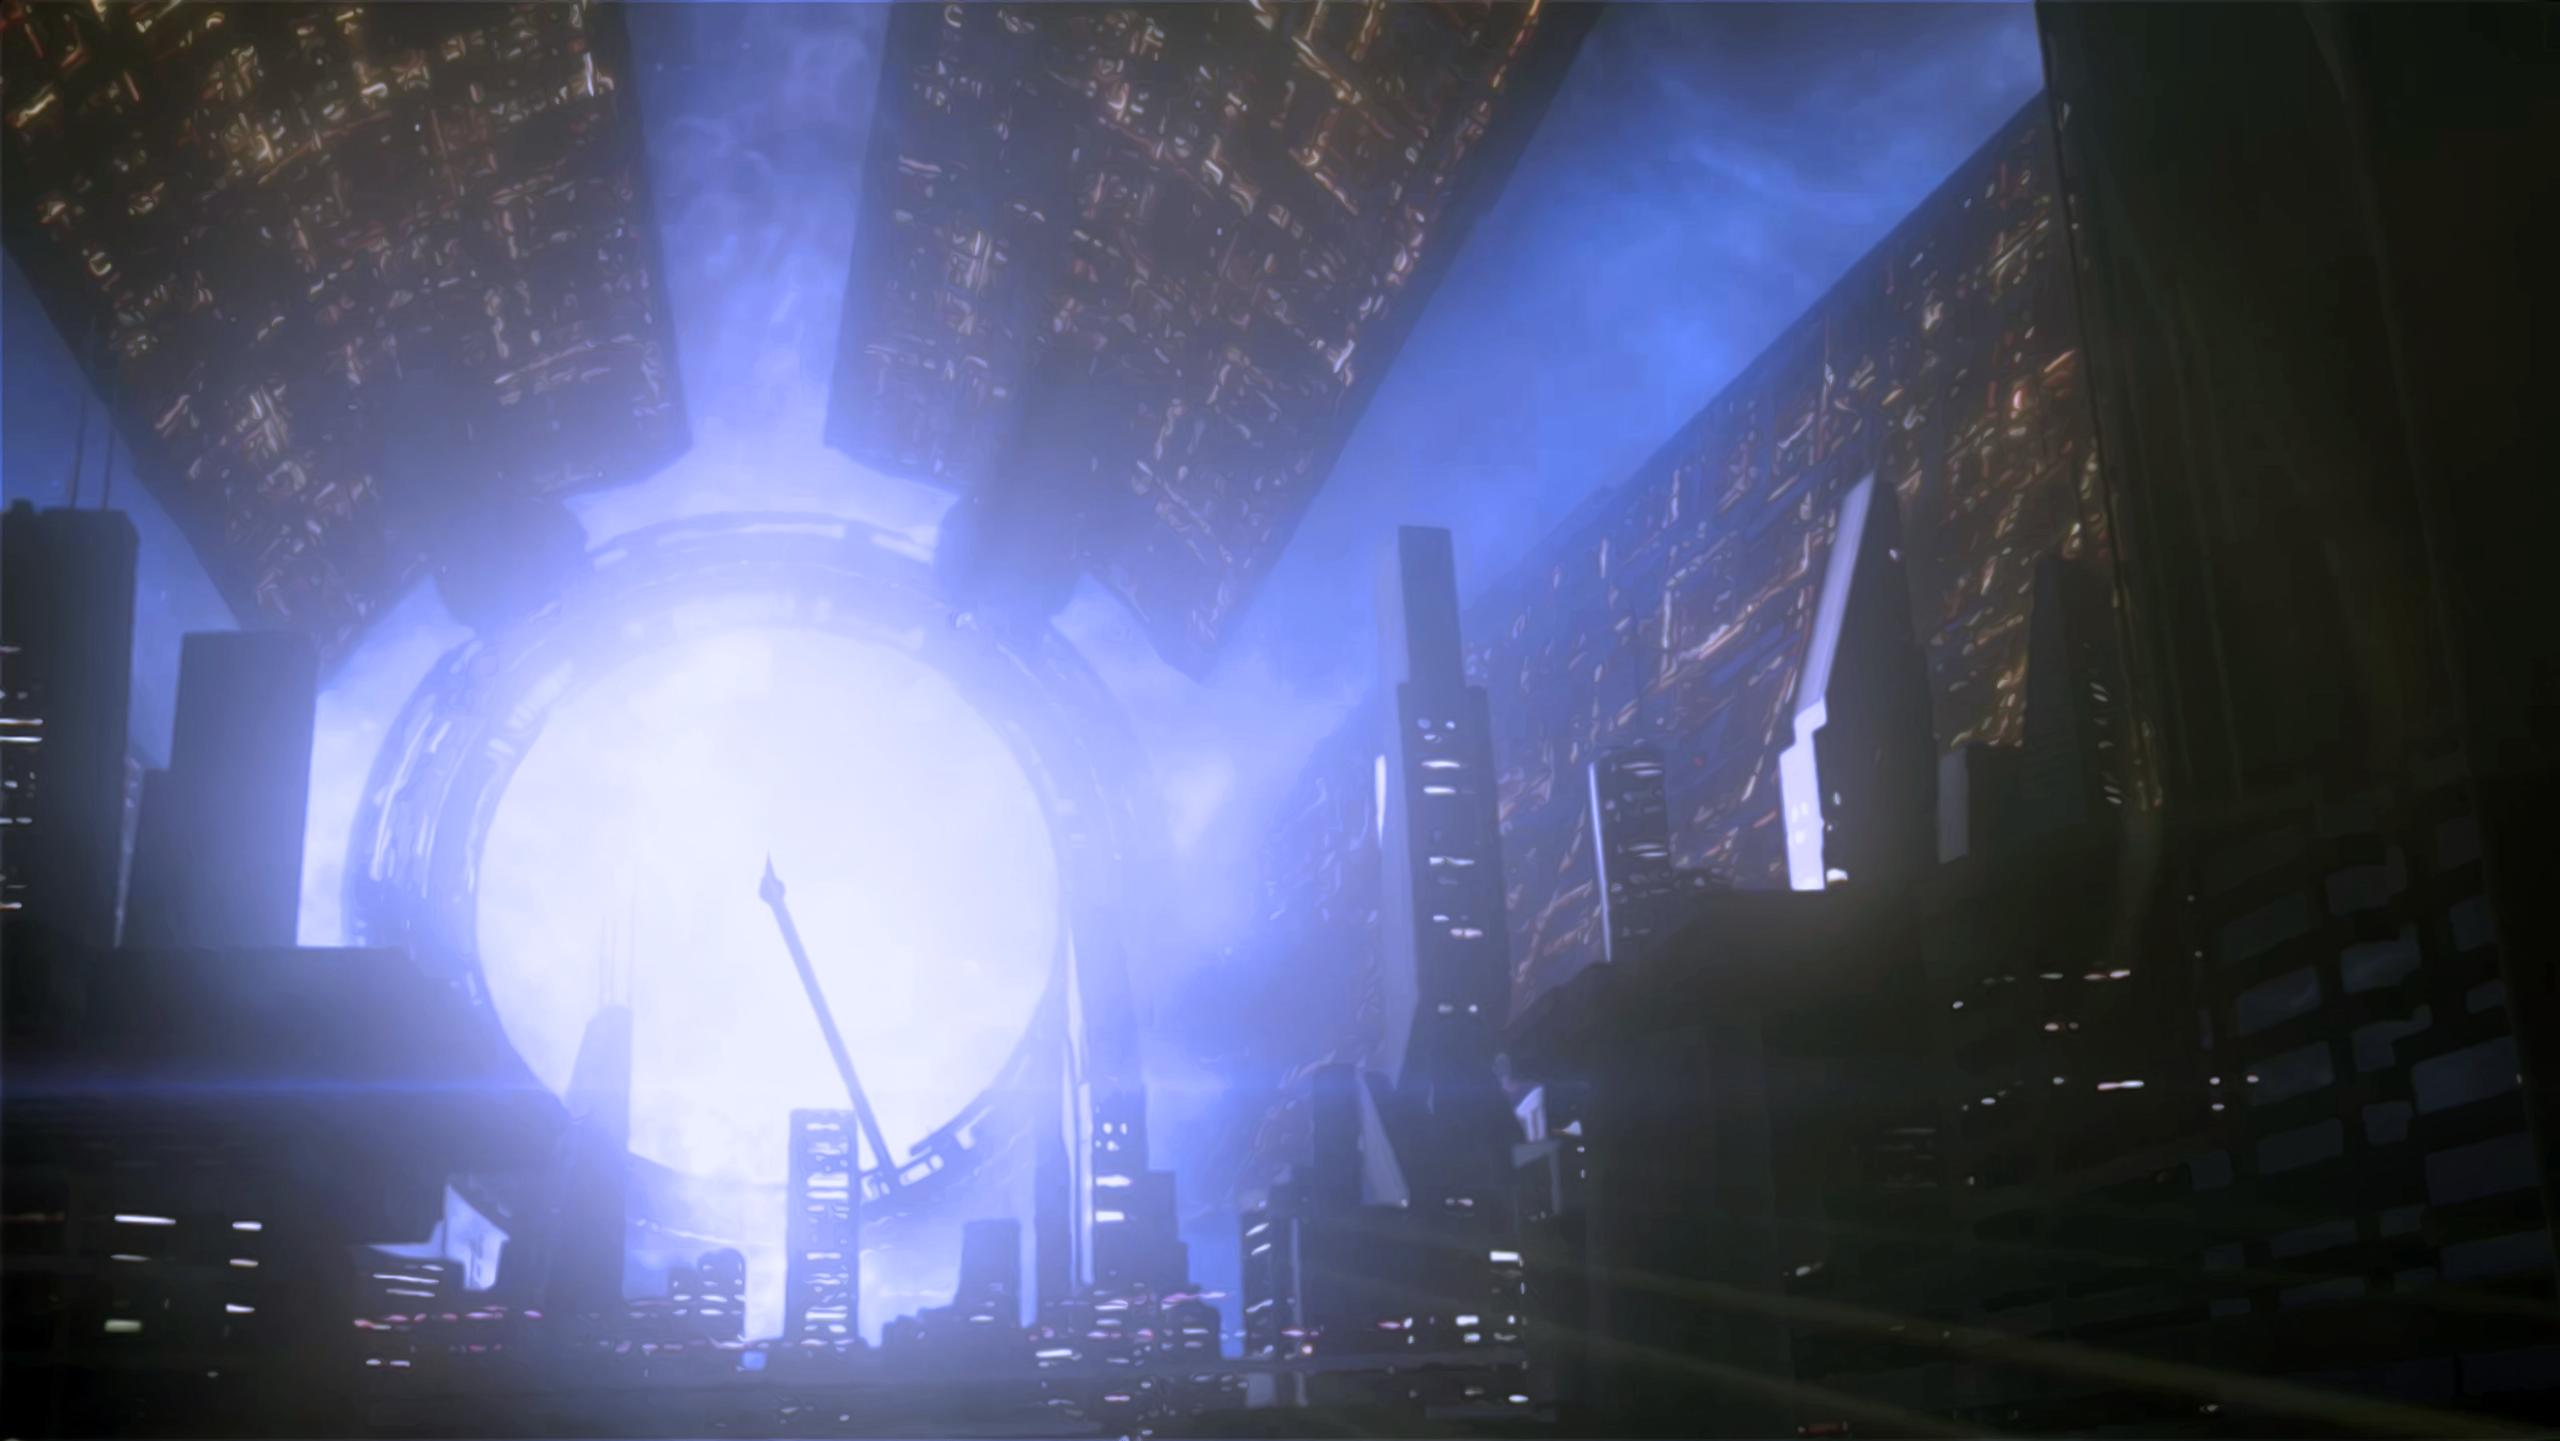 Mass Effect Desktop Backgrounds: DriverLayer Search Engine